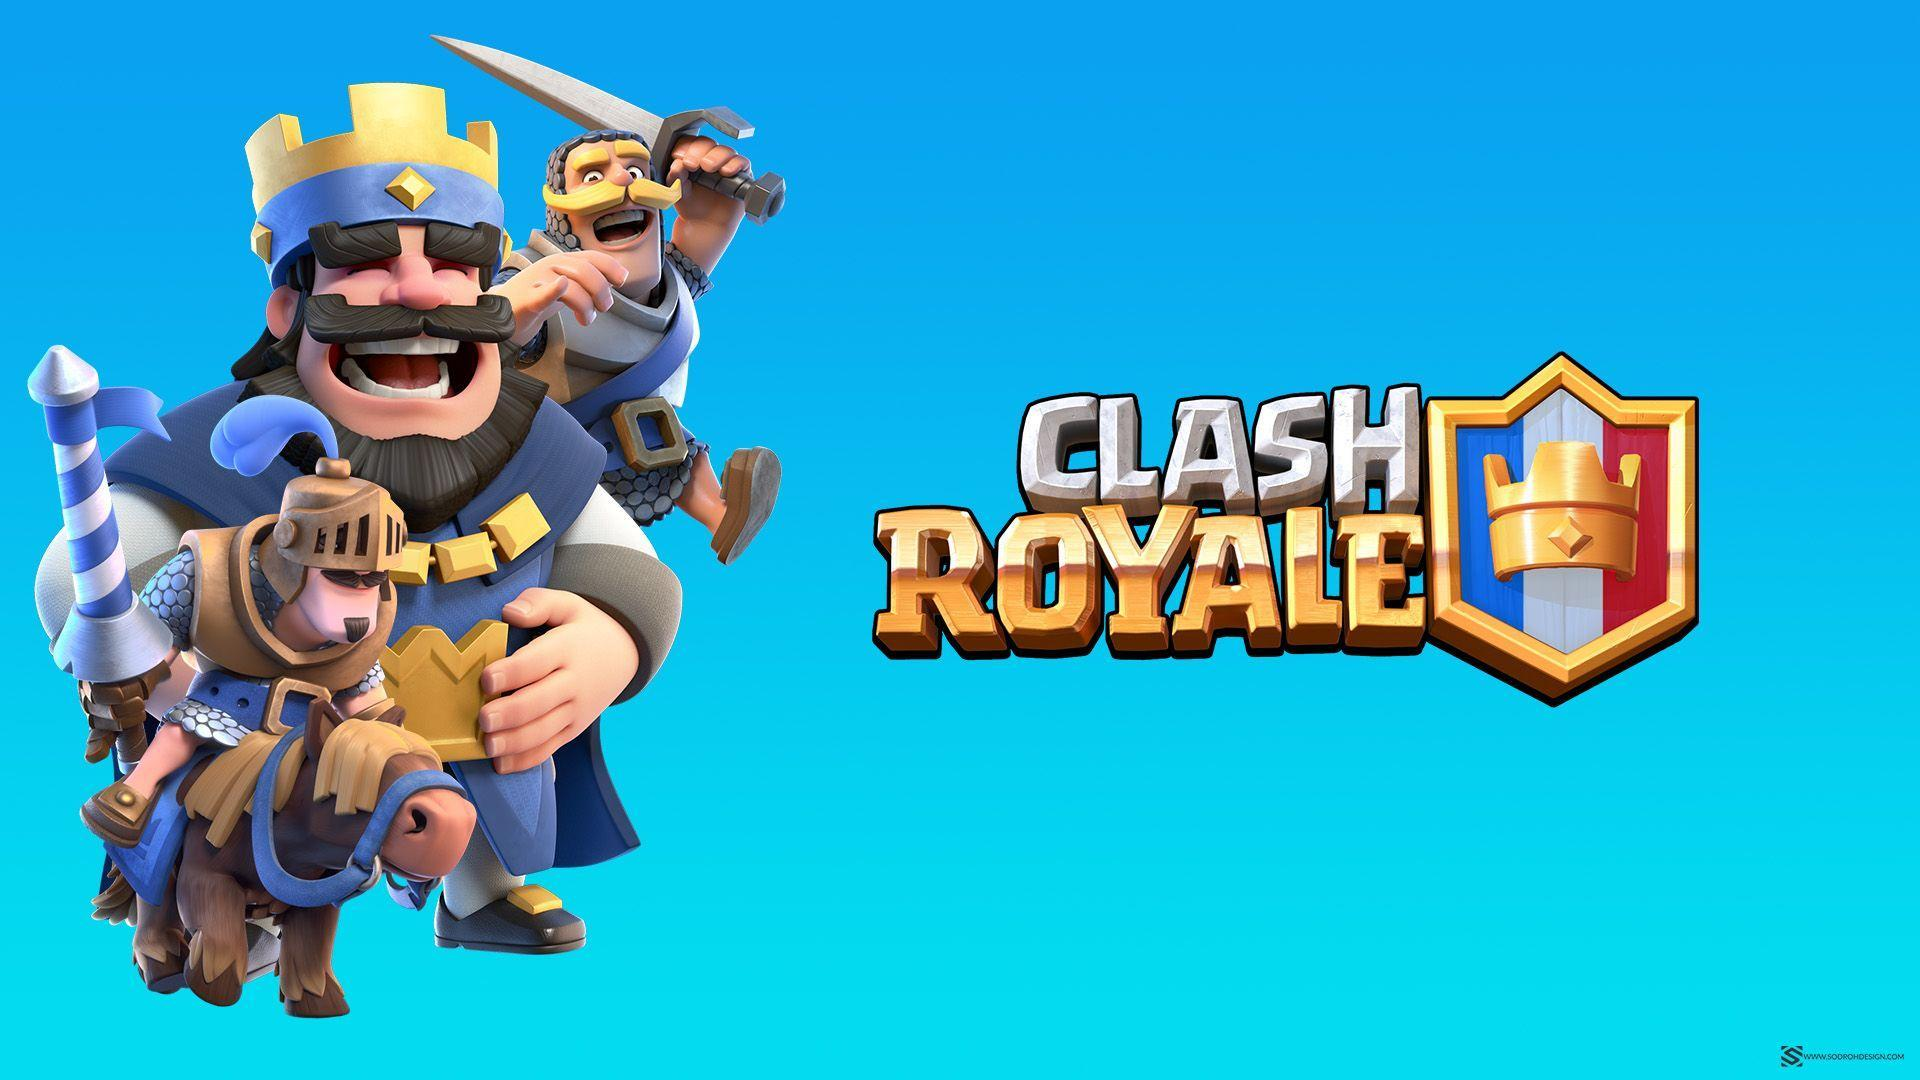 Clash Royale Wallpaper Pc - Clash Royale , HD Wallpaper & Backgrounds